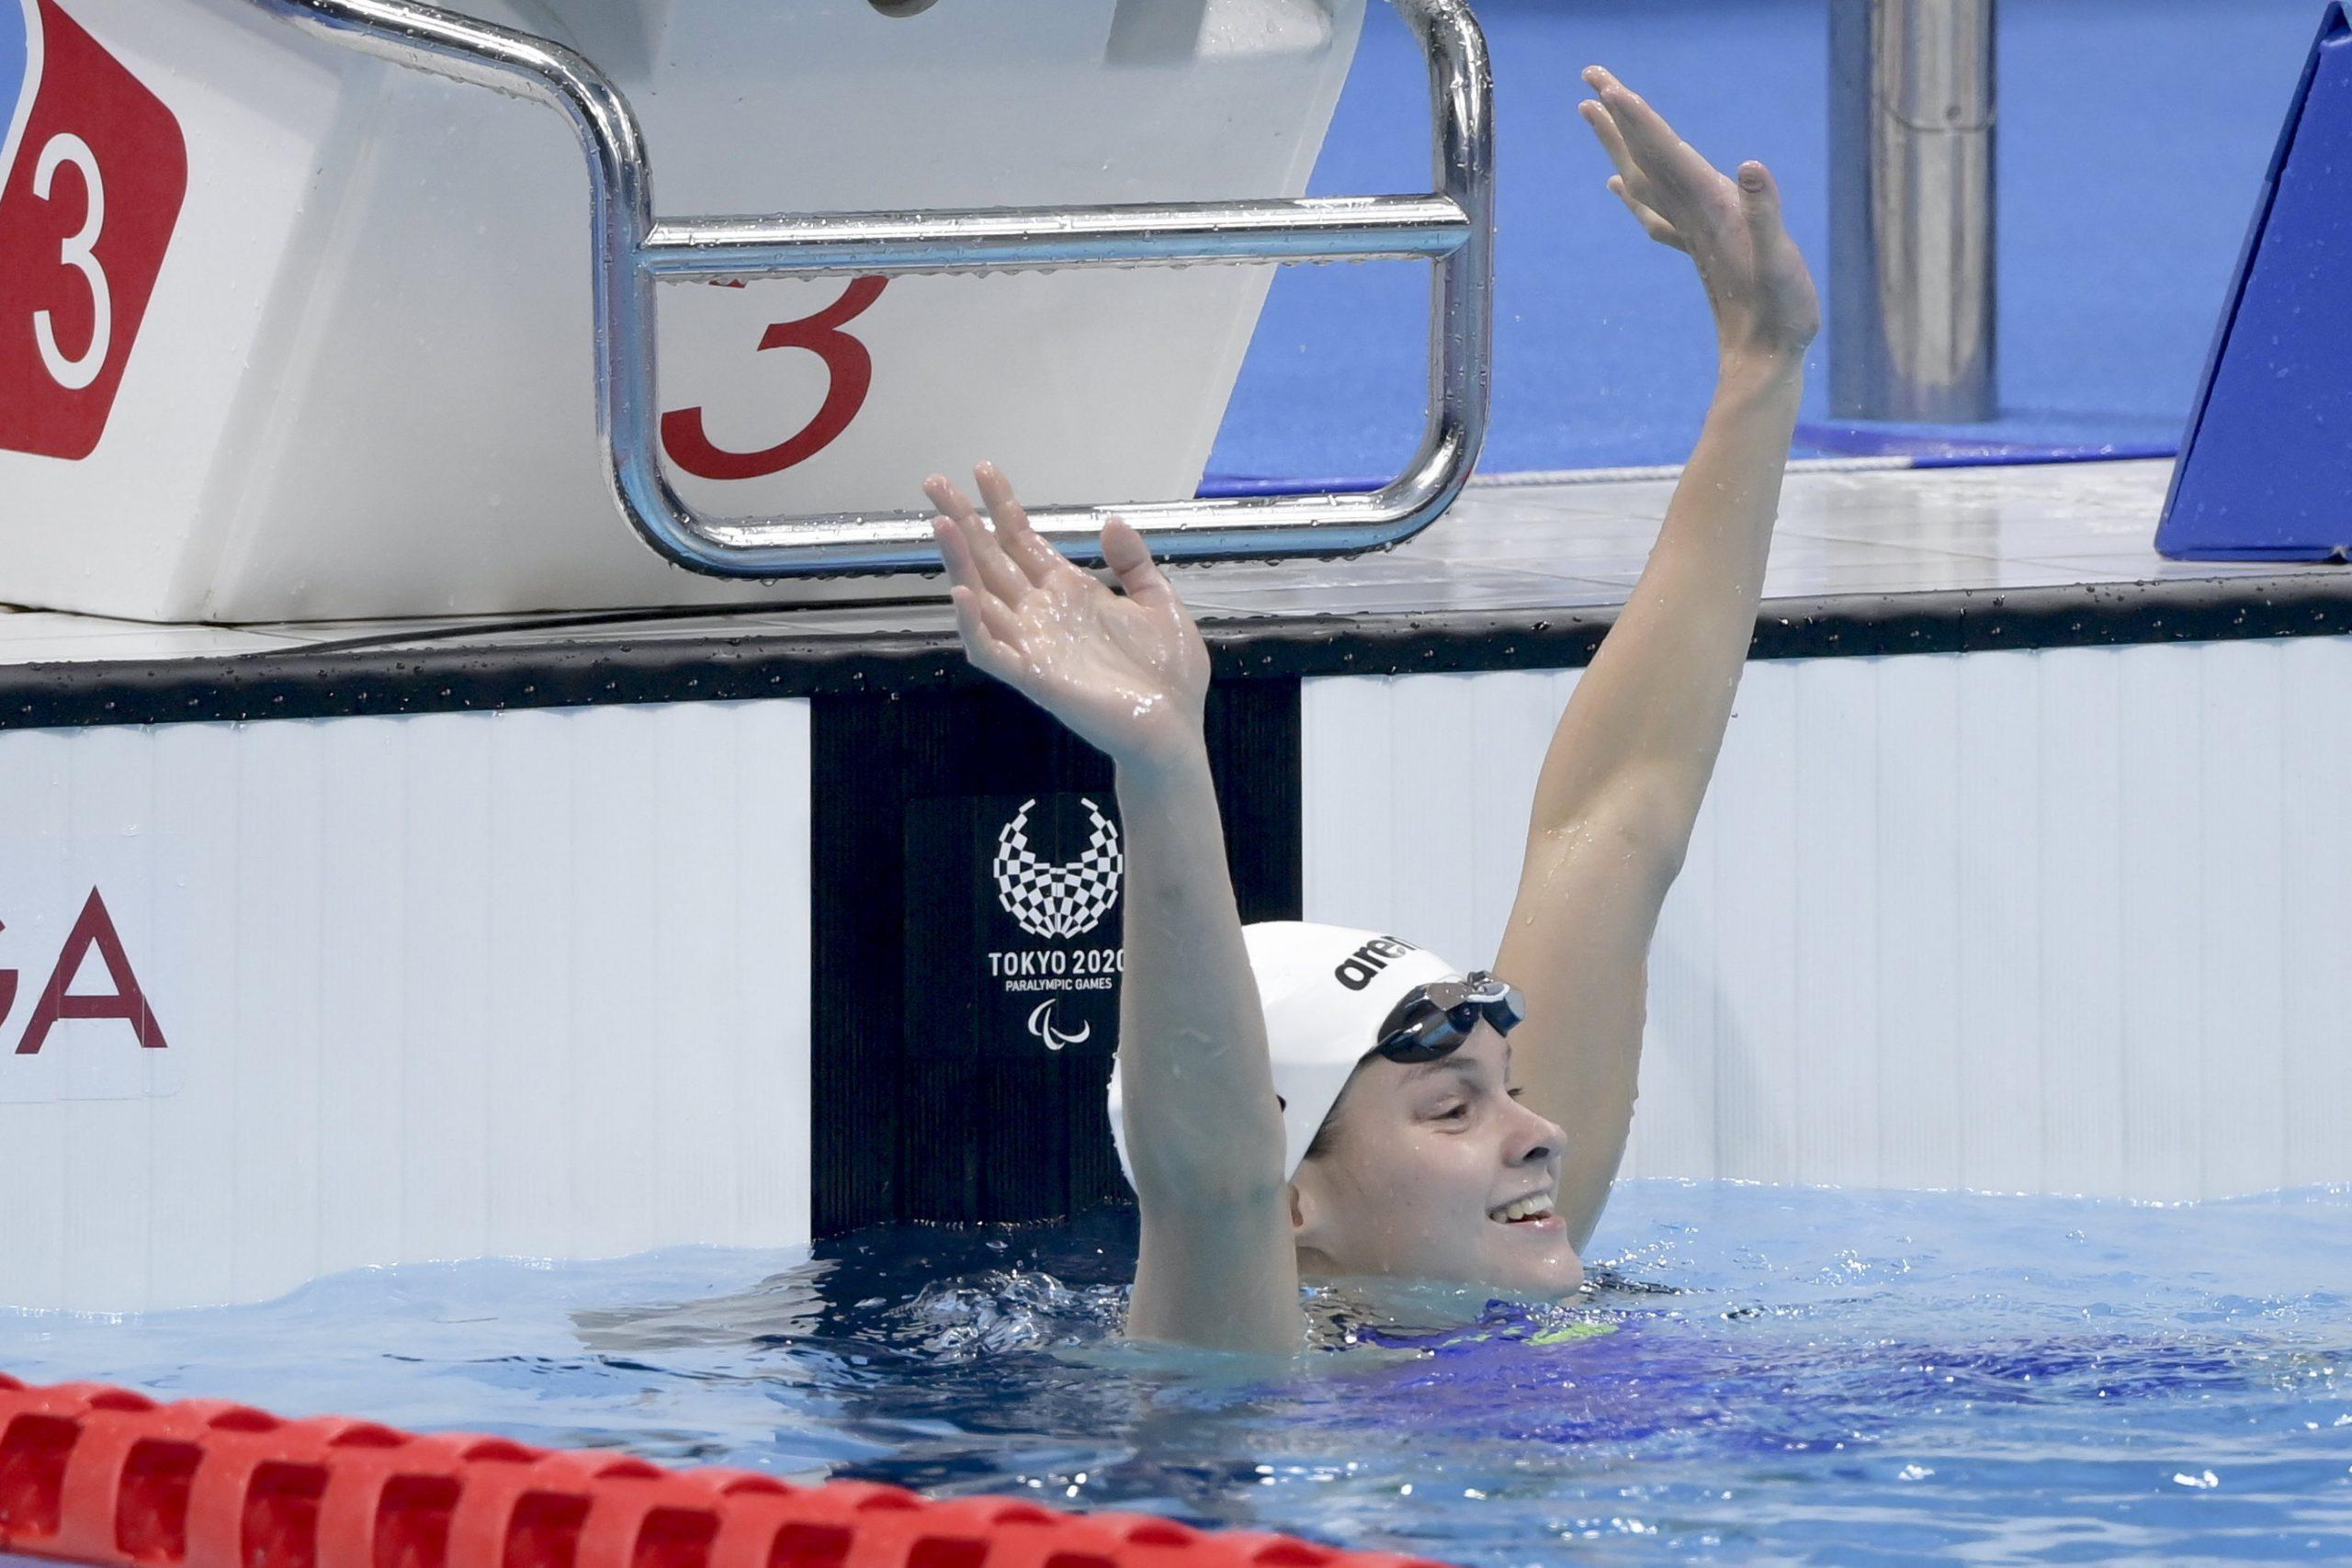 Paralympics: Schwimmerin Bianka Pap holt Silbermedaille